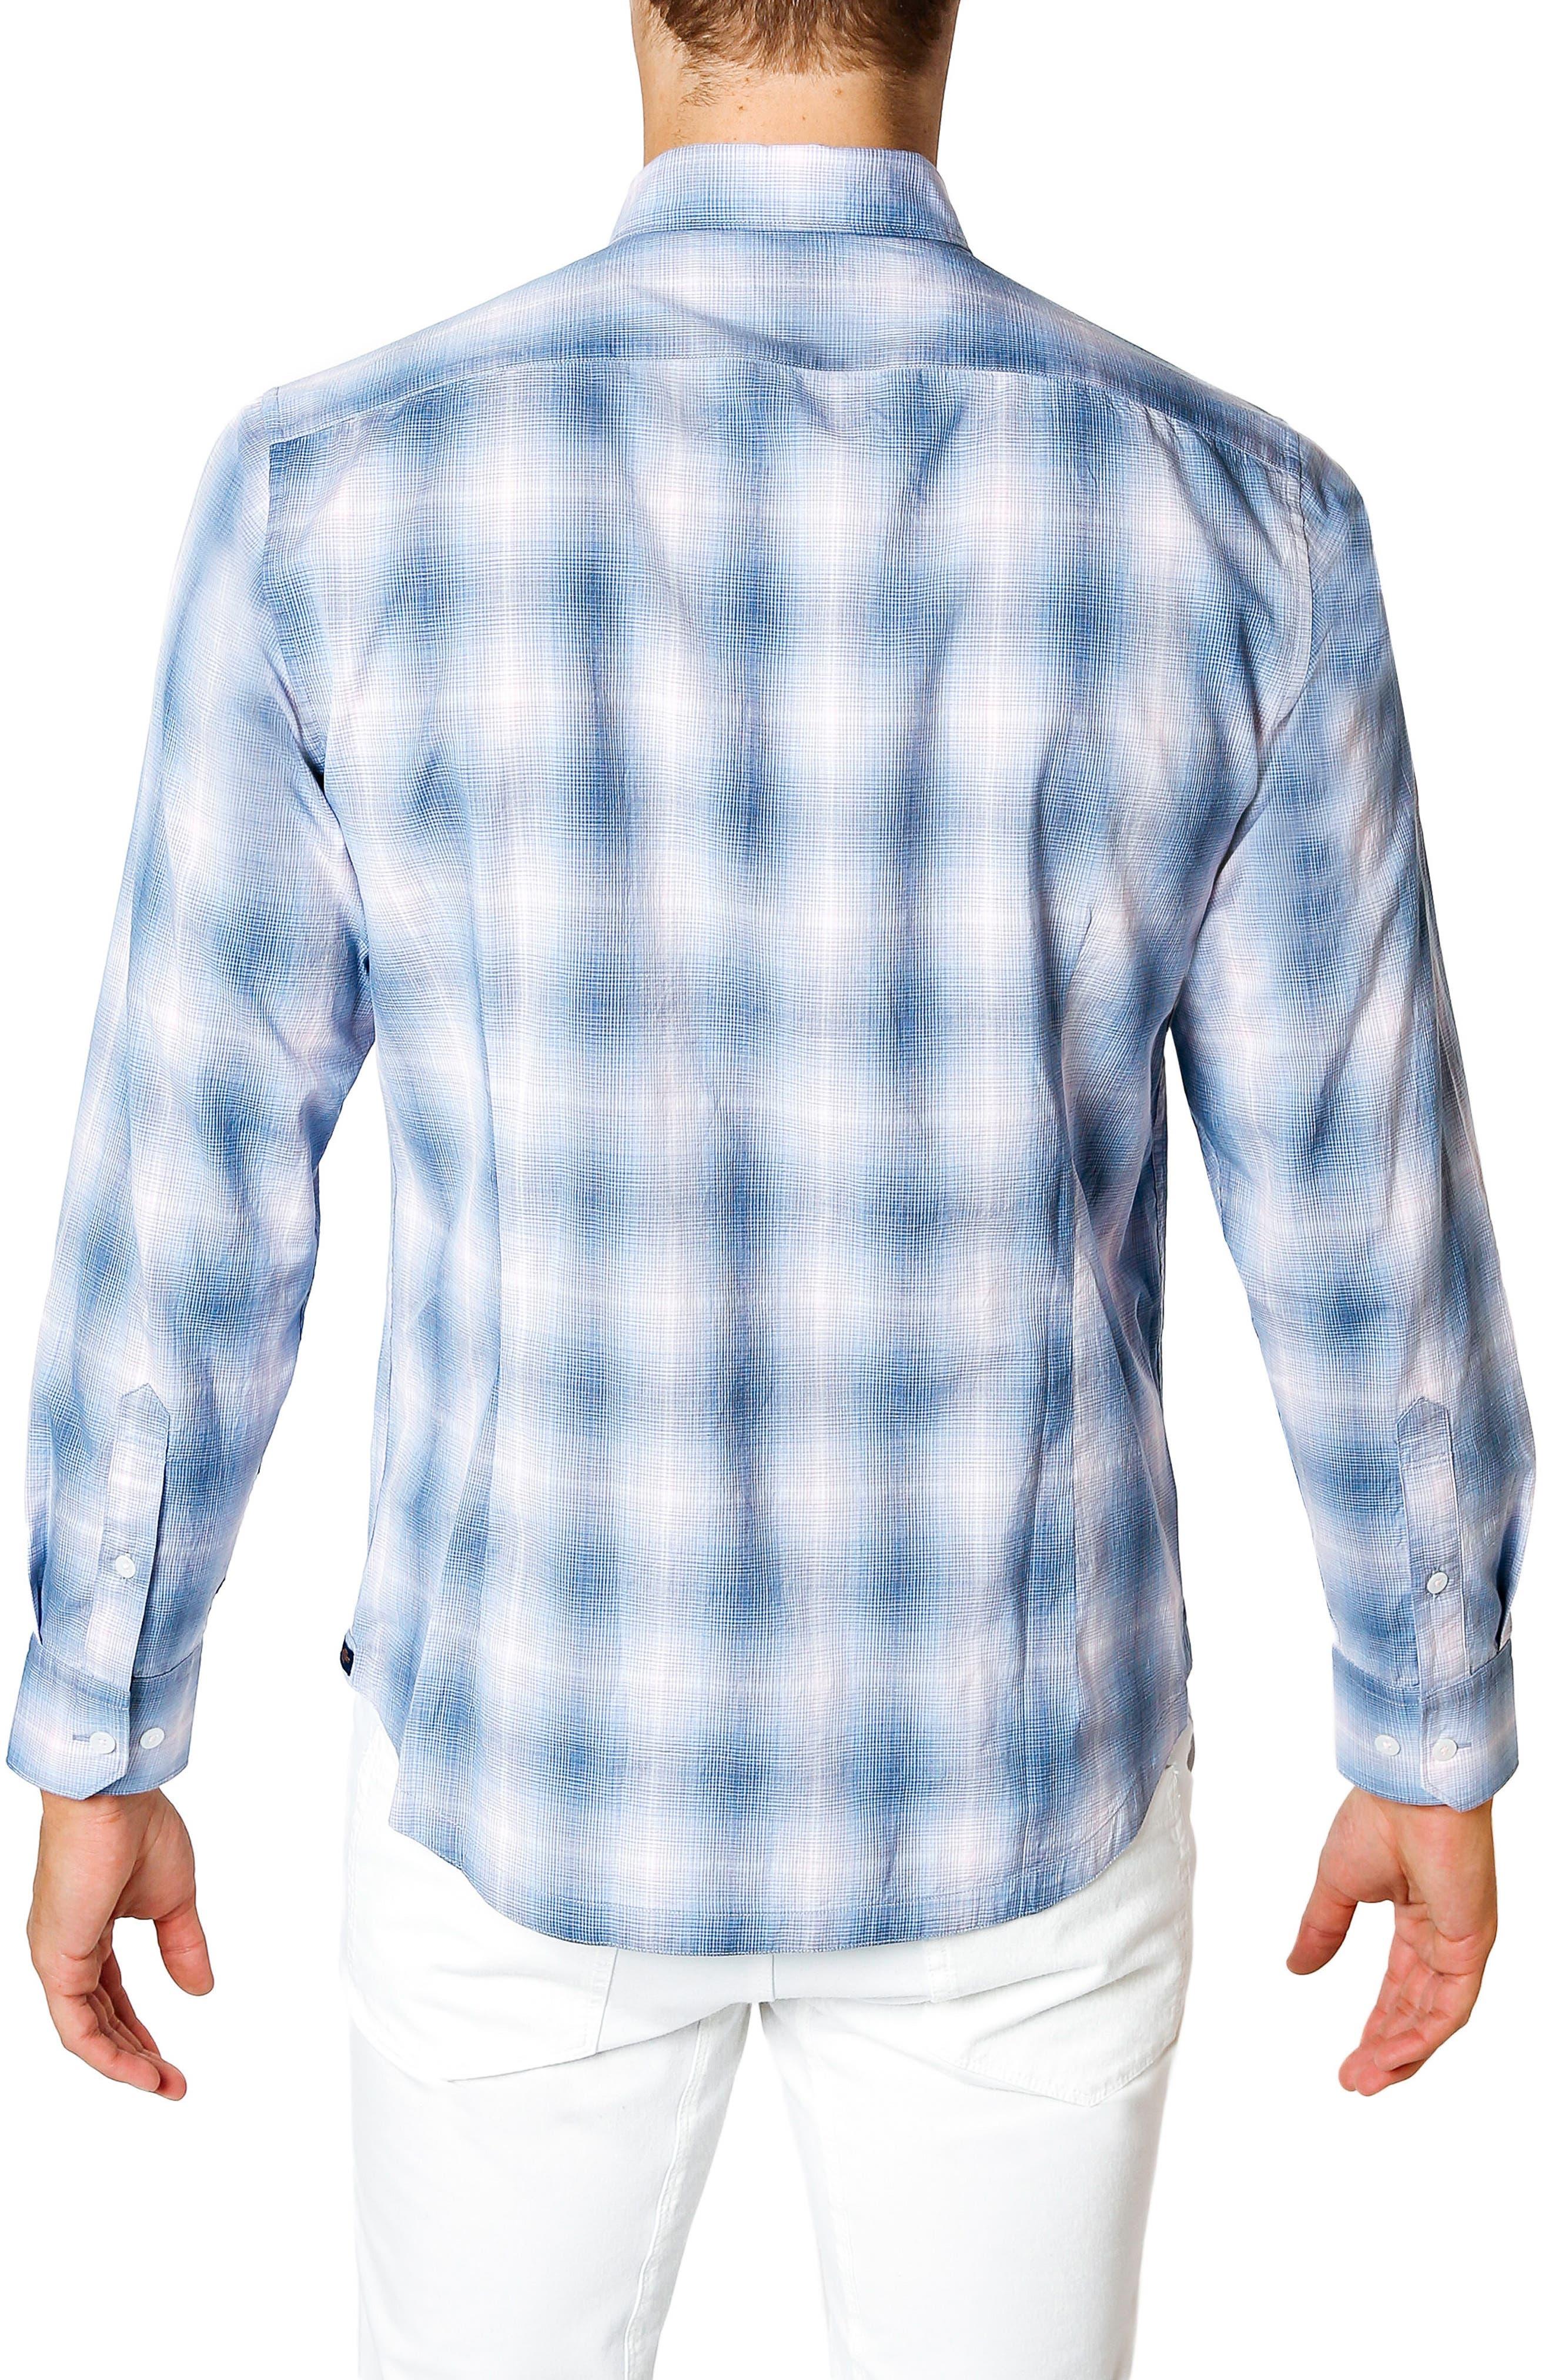 Sunset Slim Fit Sport Shirt,                             Alternate thumbnail 2, color,